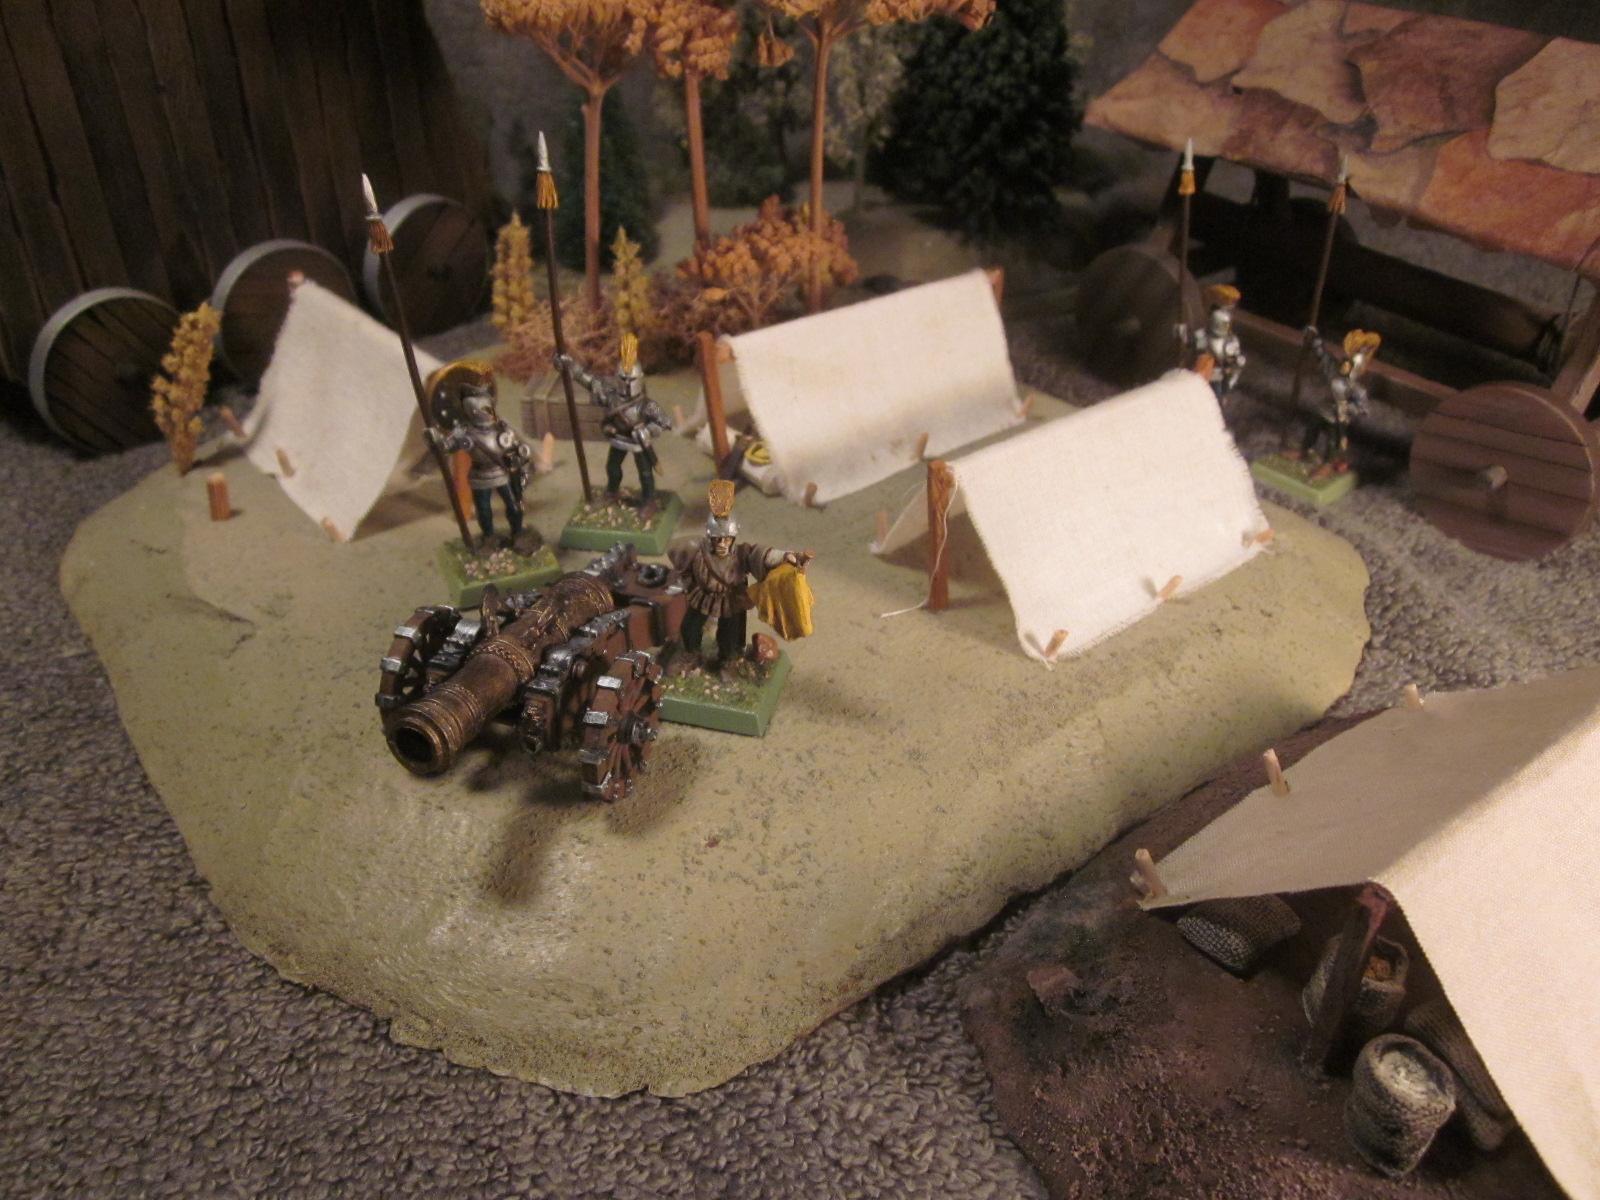 battleground hobbies how to build tents for a historical or warhammer siege encampment. Black Bedroom Furniture Sets. Home Design Ideas